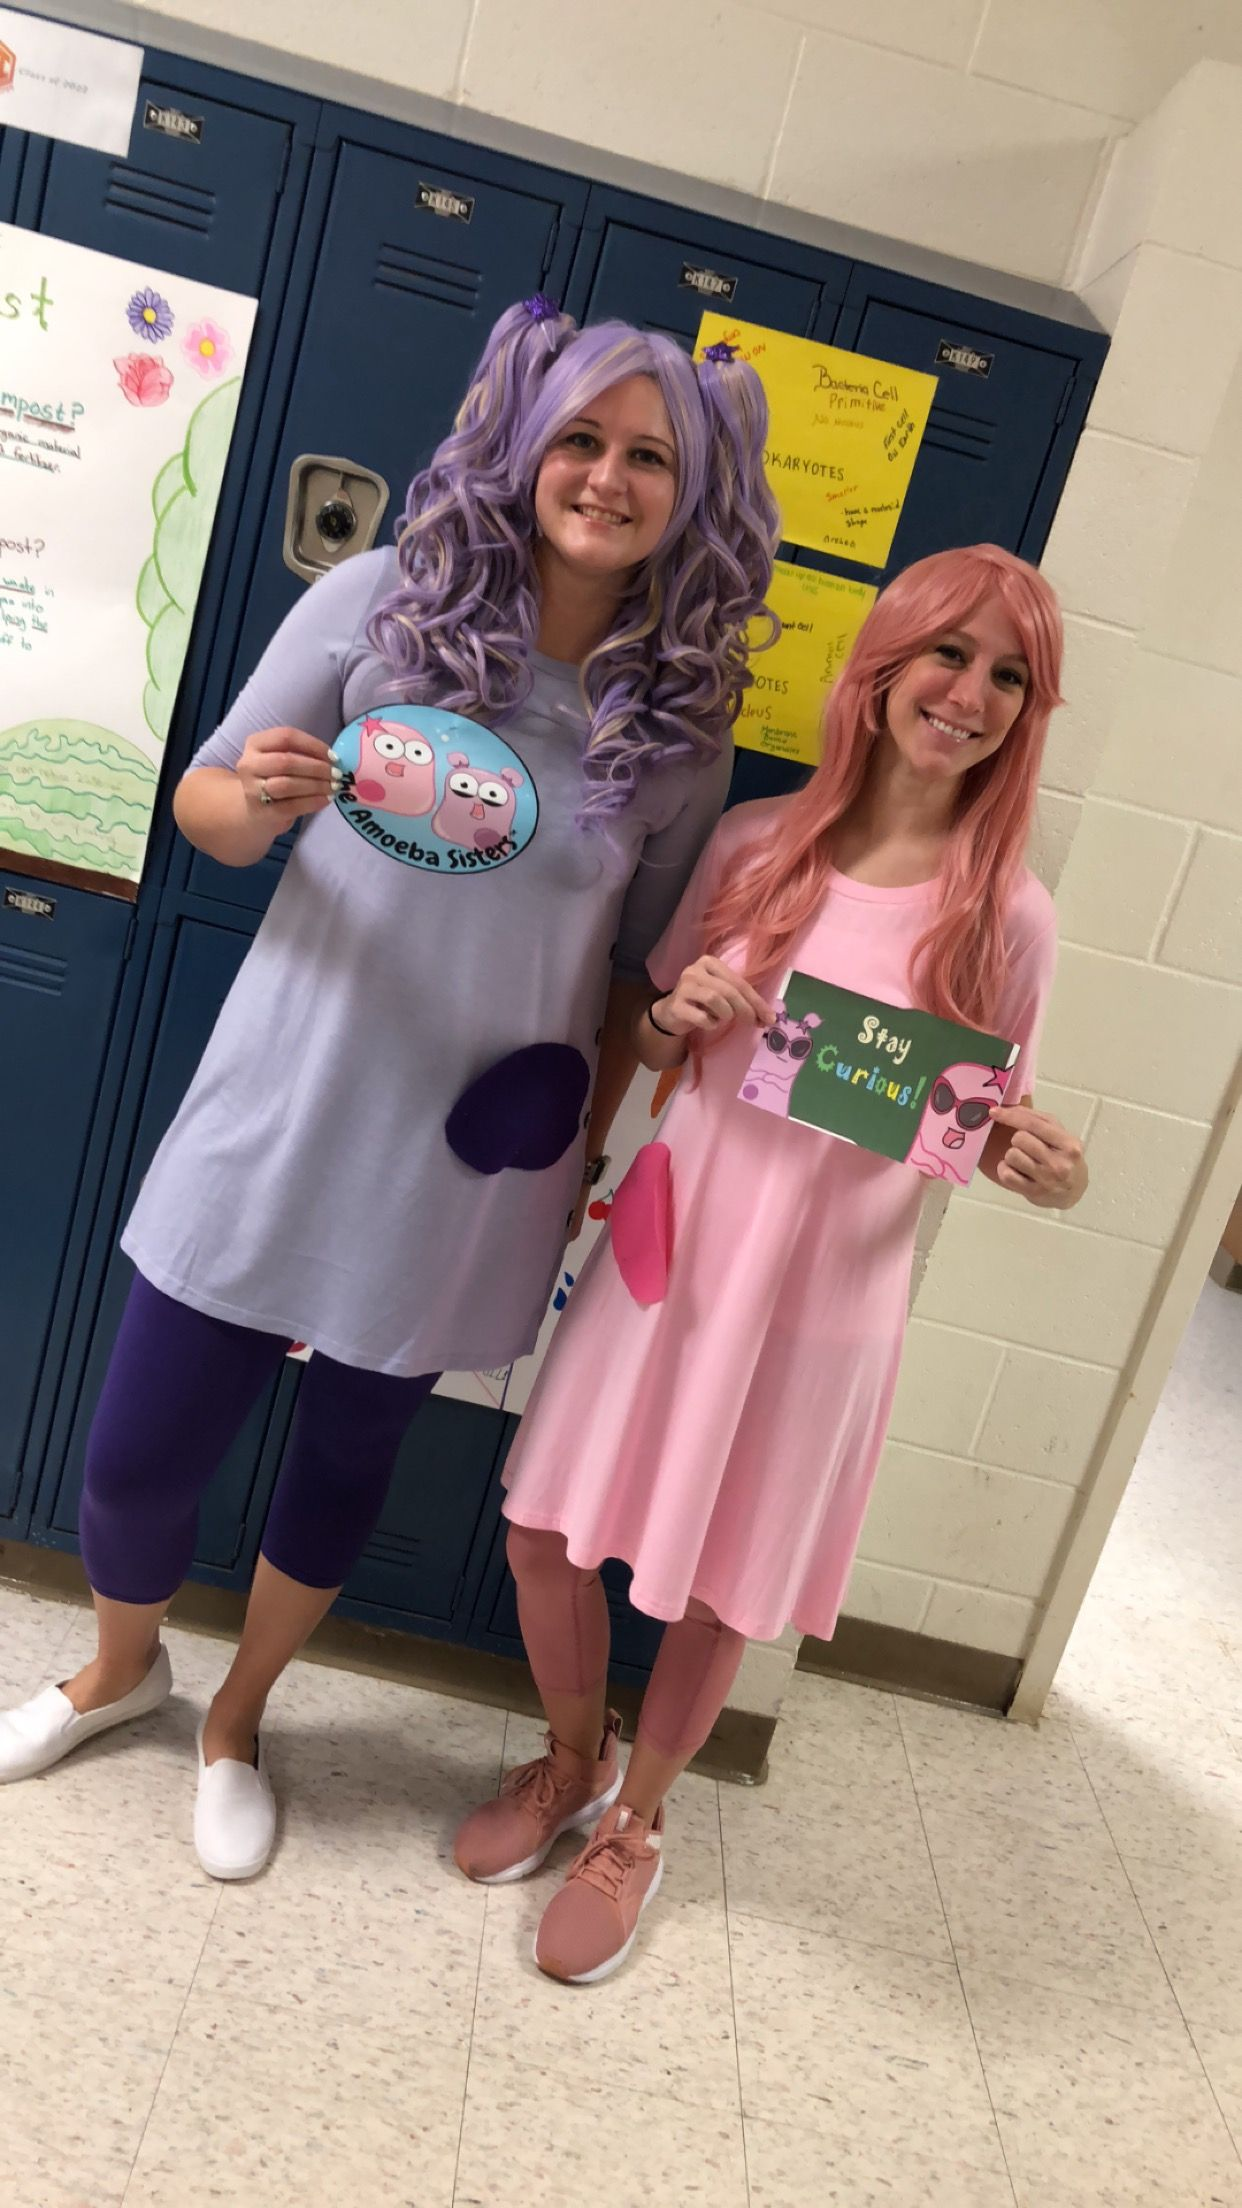 Character Day For Spirit Week Biology Teachers Dress Up As Amoeba Sisters Characterday Spiritweek Biology Amo Teacher Dresses Old Lady Costume Spirit Week